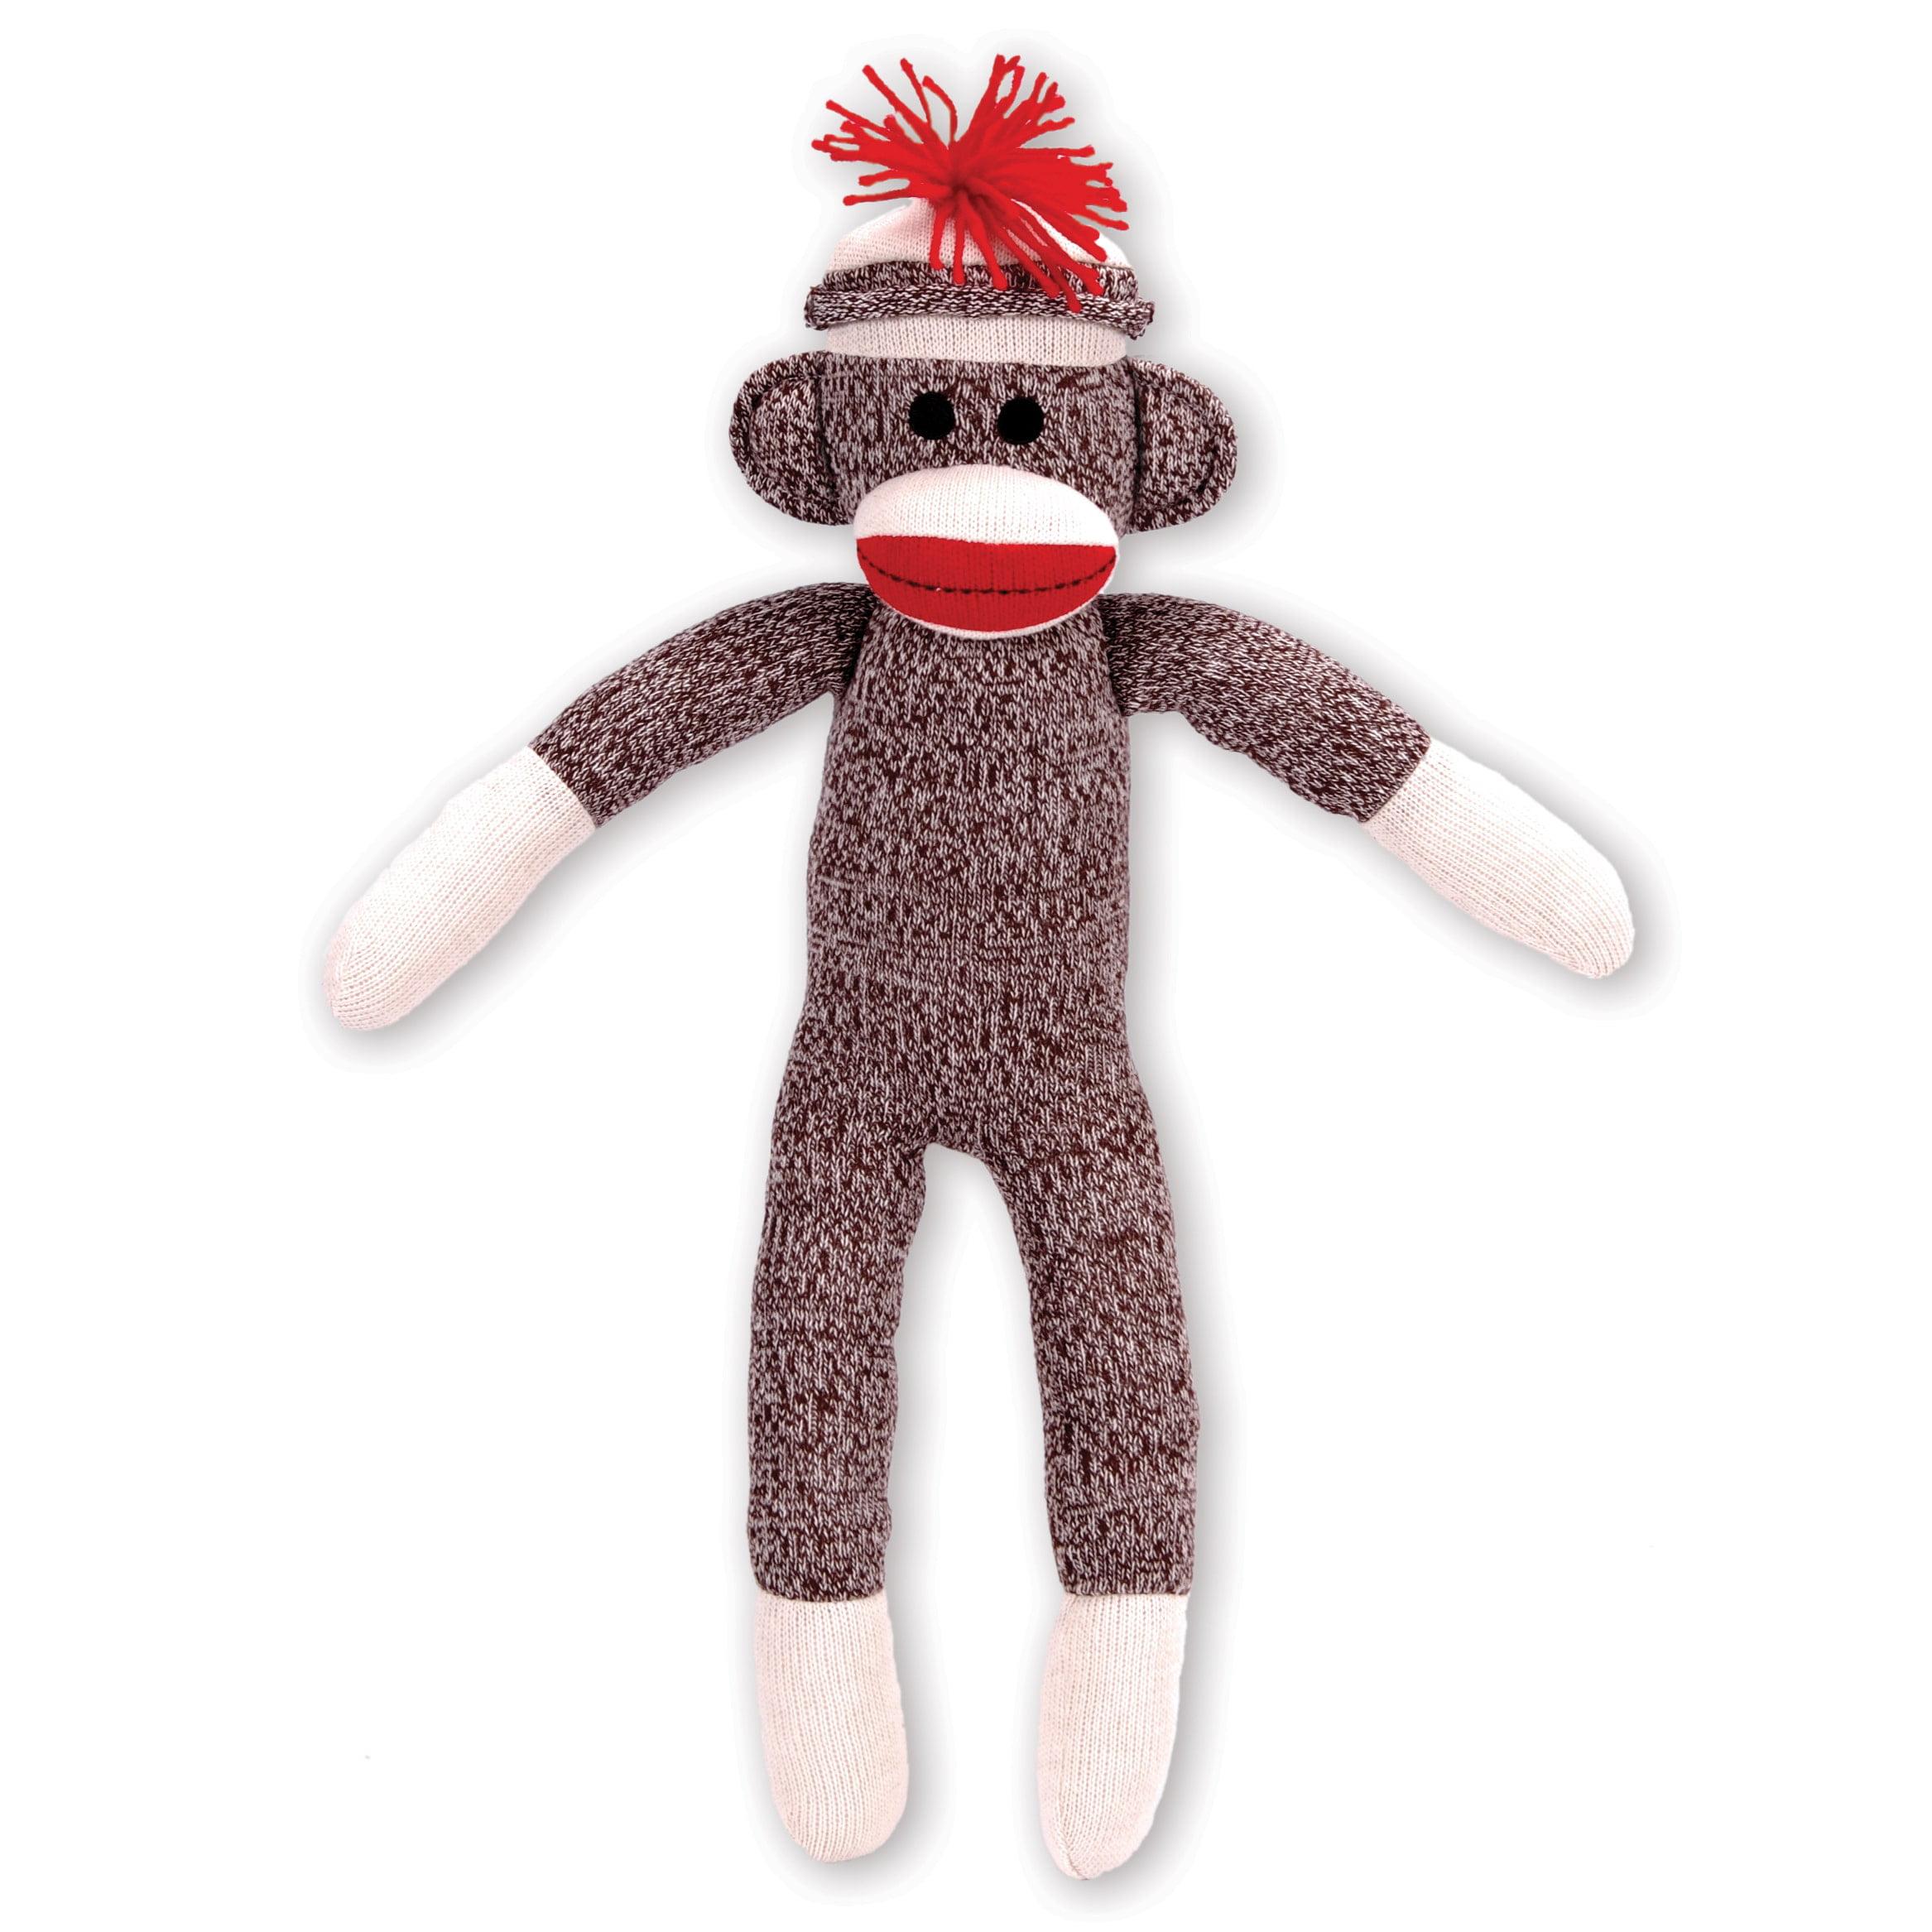 Schylling Schylling Sock Monkey Stuffed Animal Walmart Com